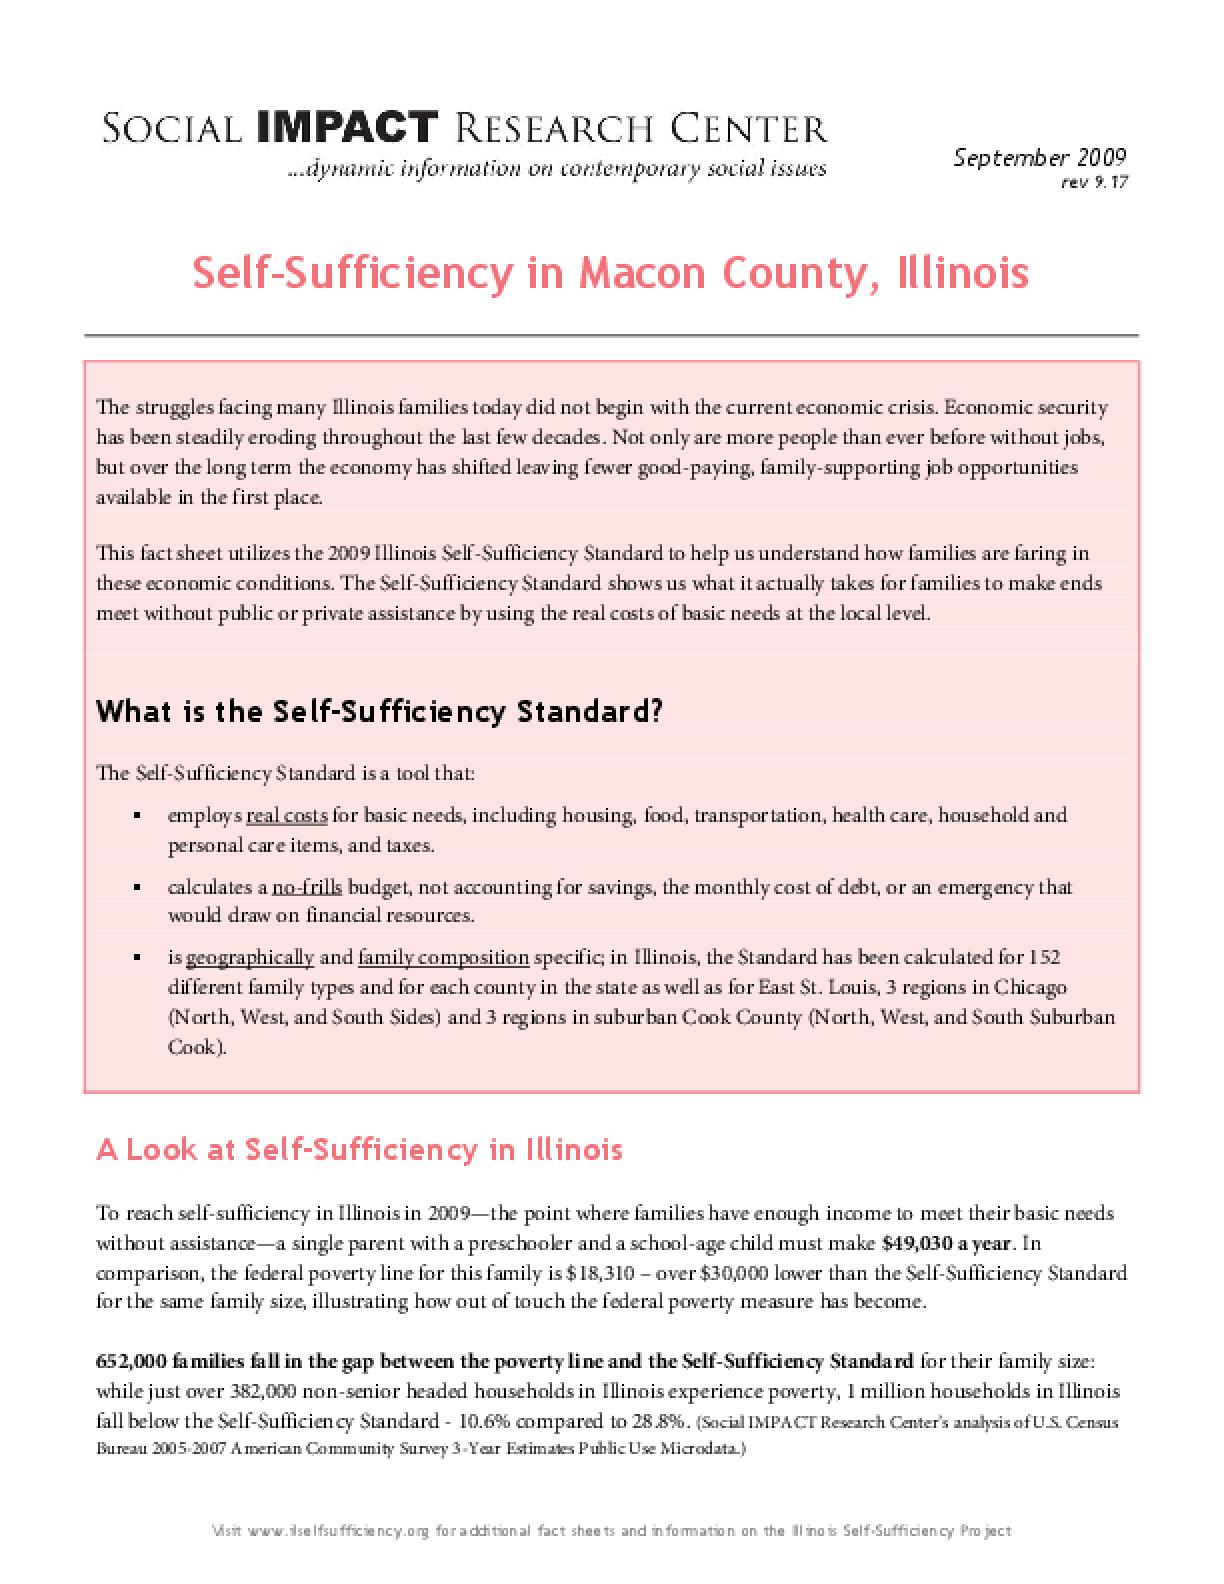 Self-Sufficiency in Macon County, Illinois